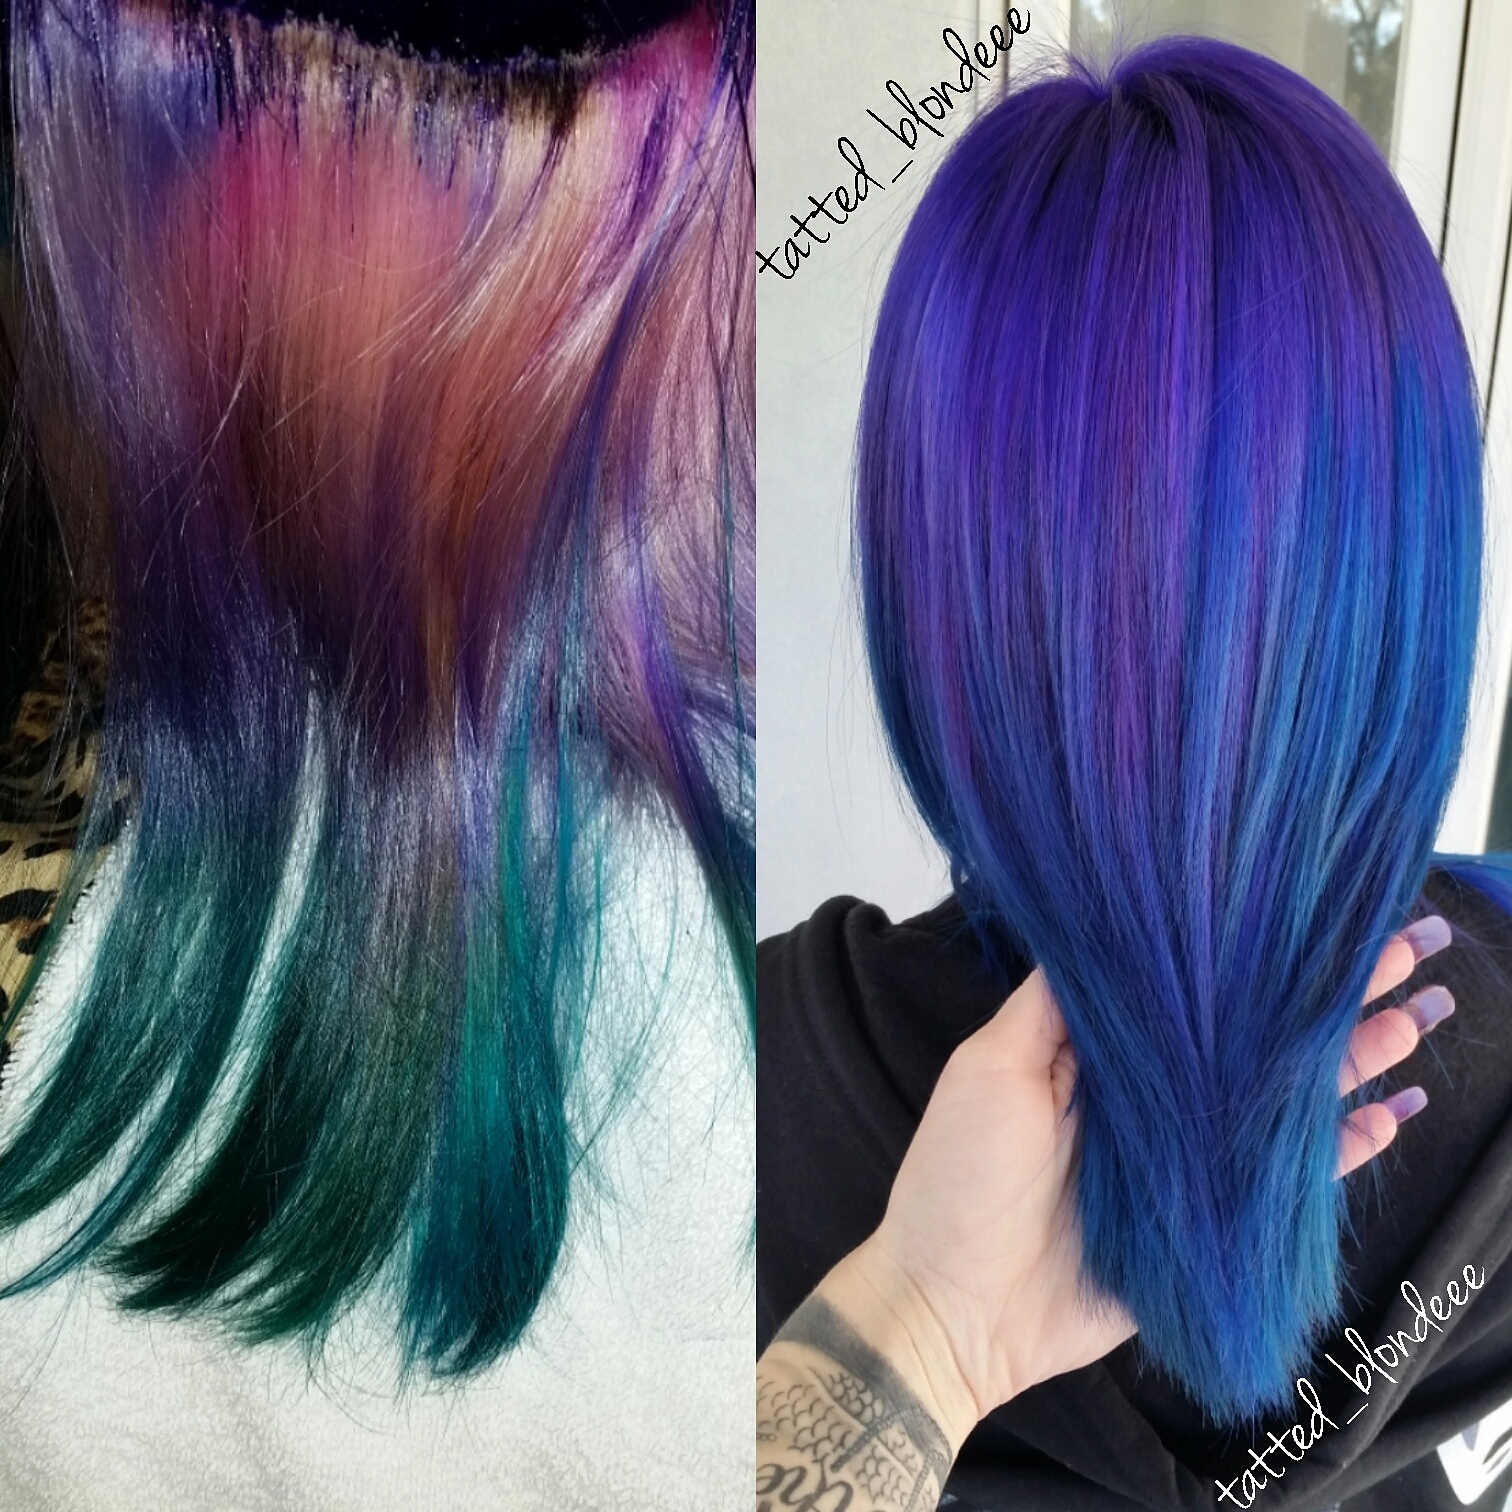 TRANSFORMATION: Faded Fun To Purple/Blue Melt